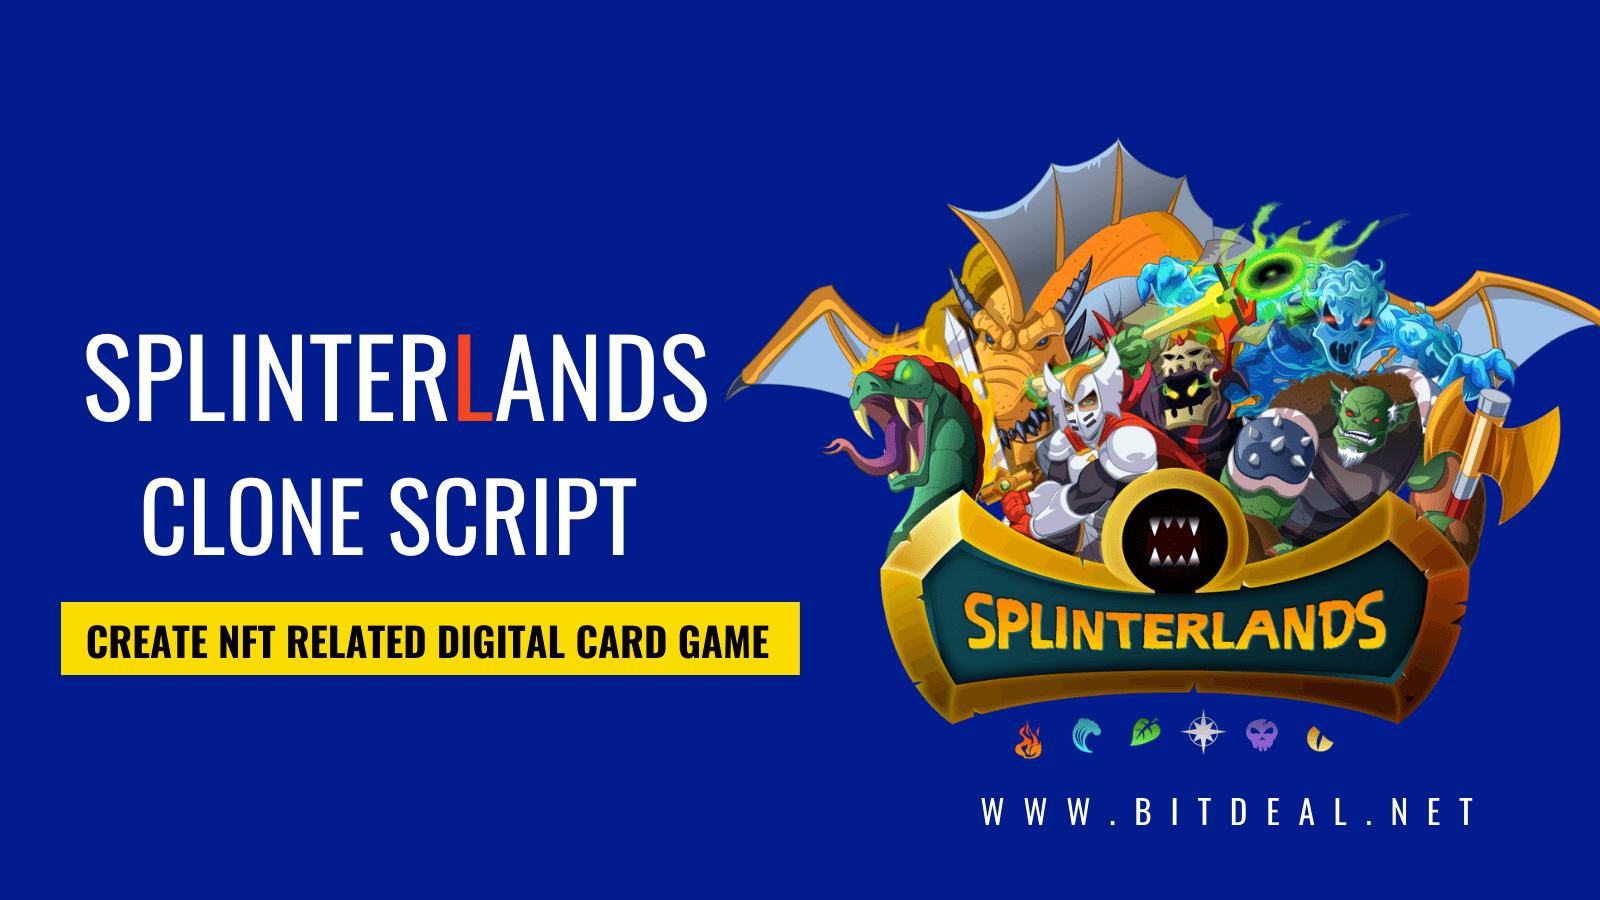 Create Your Own NFT- Based Digital Card Game like Splinterlands